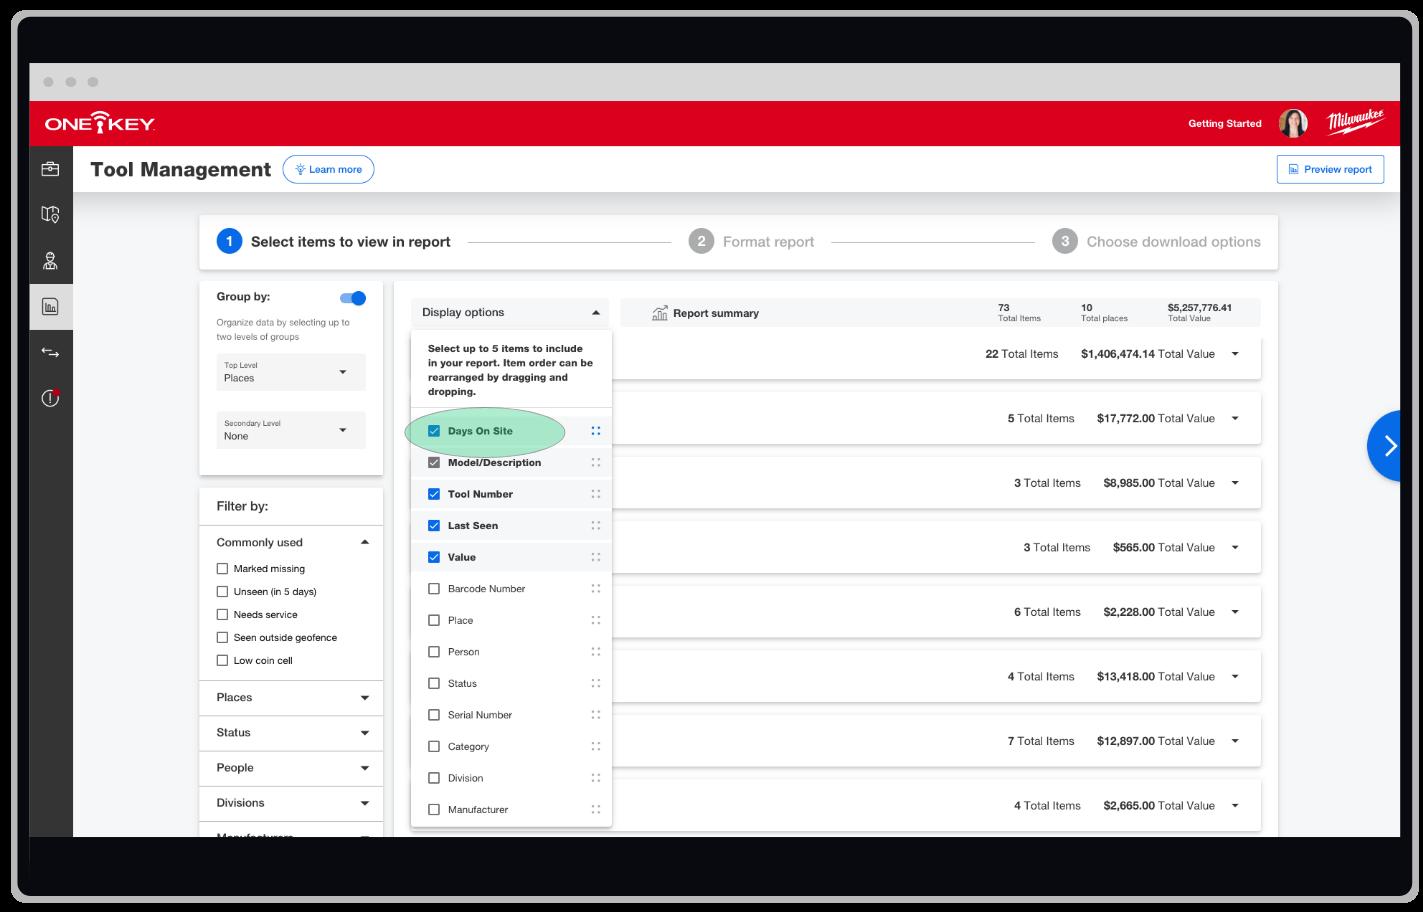 One-Key web app displays tool management report builder